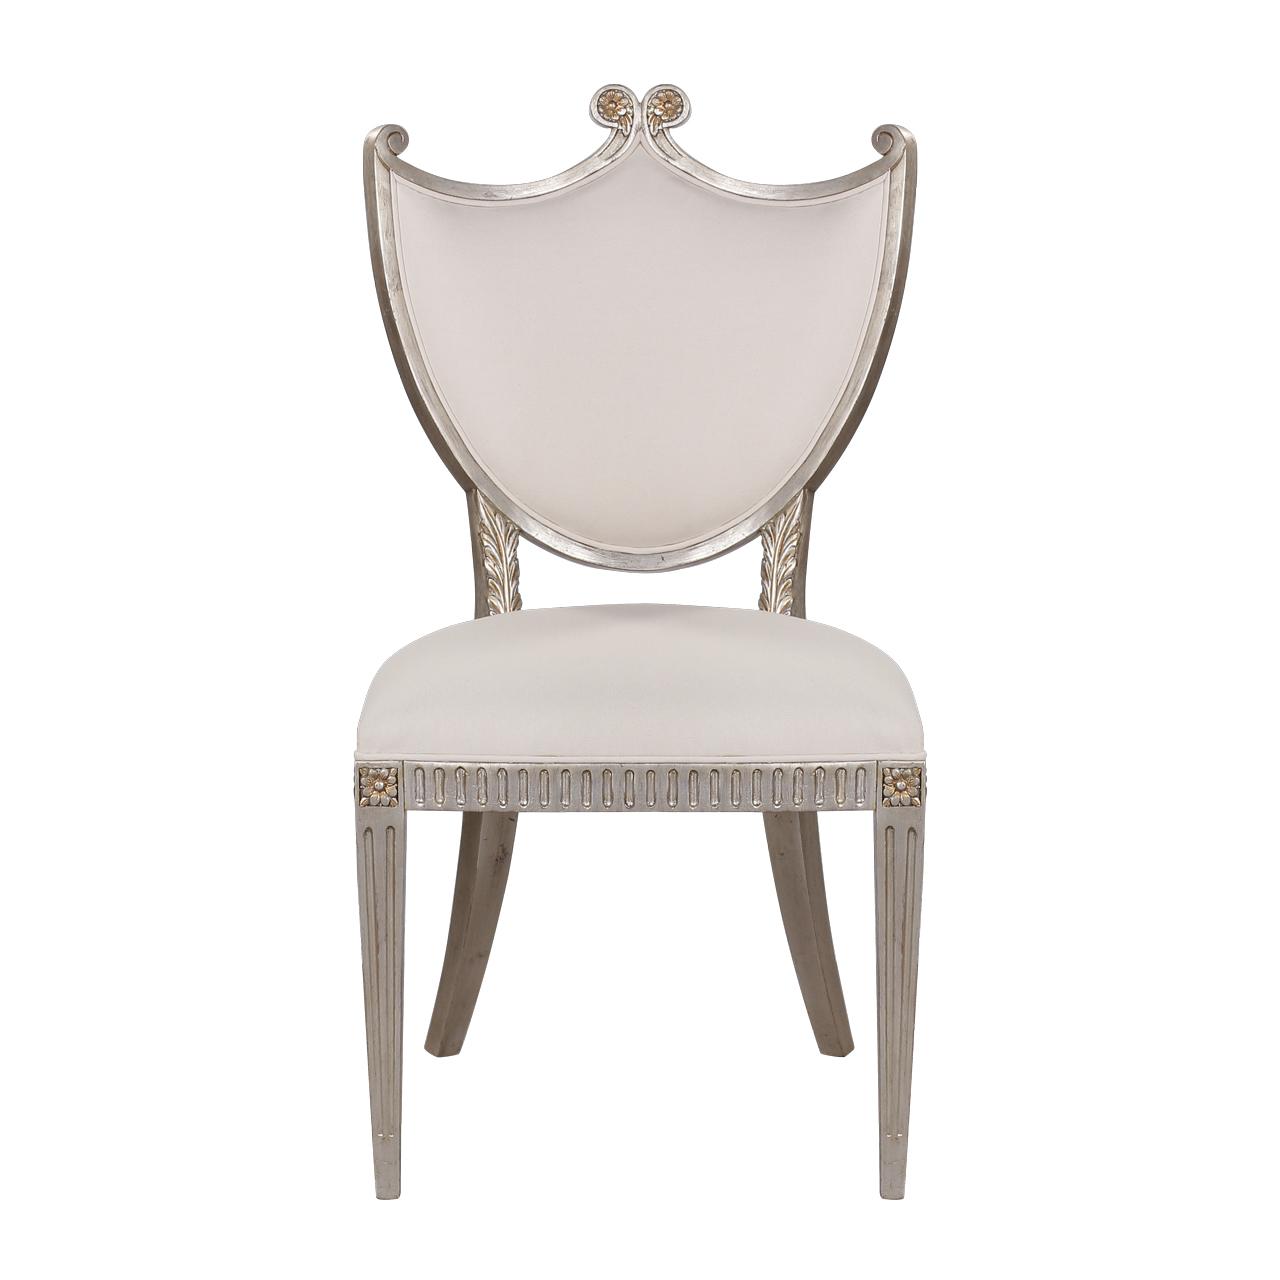 34597-2---Side-Chair-Hepplewhite-Shield-Back,-NF15--Cal-1